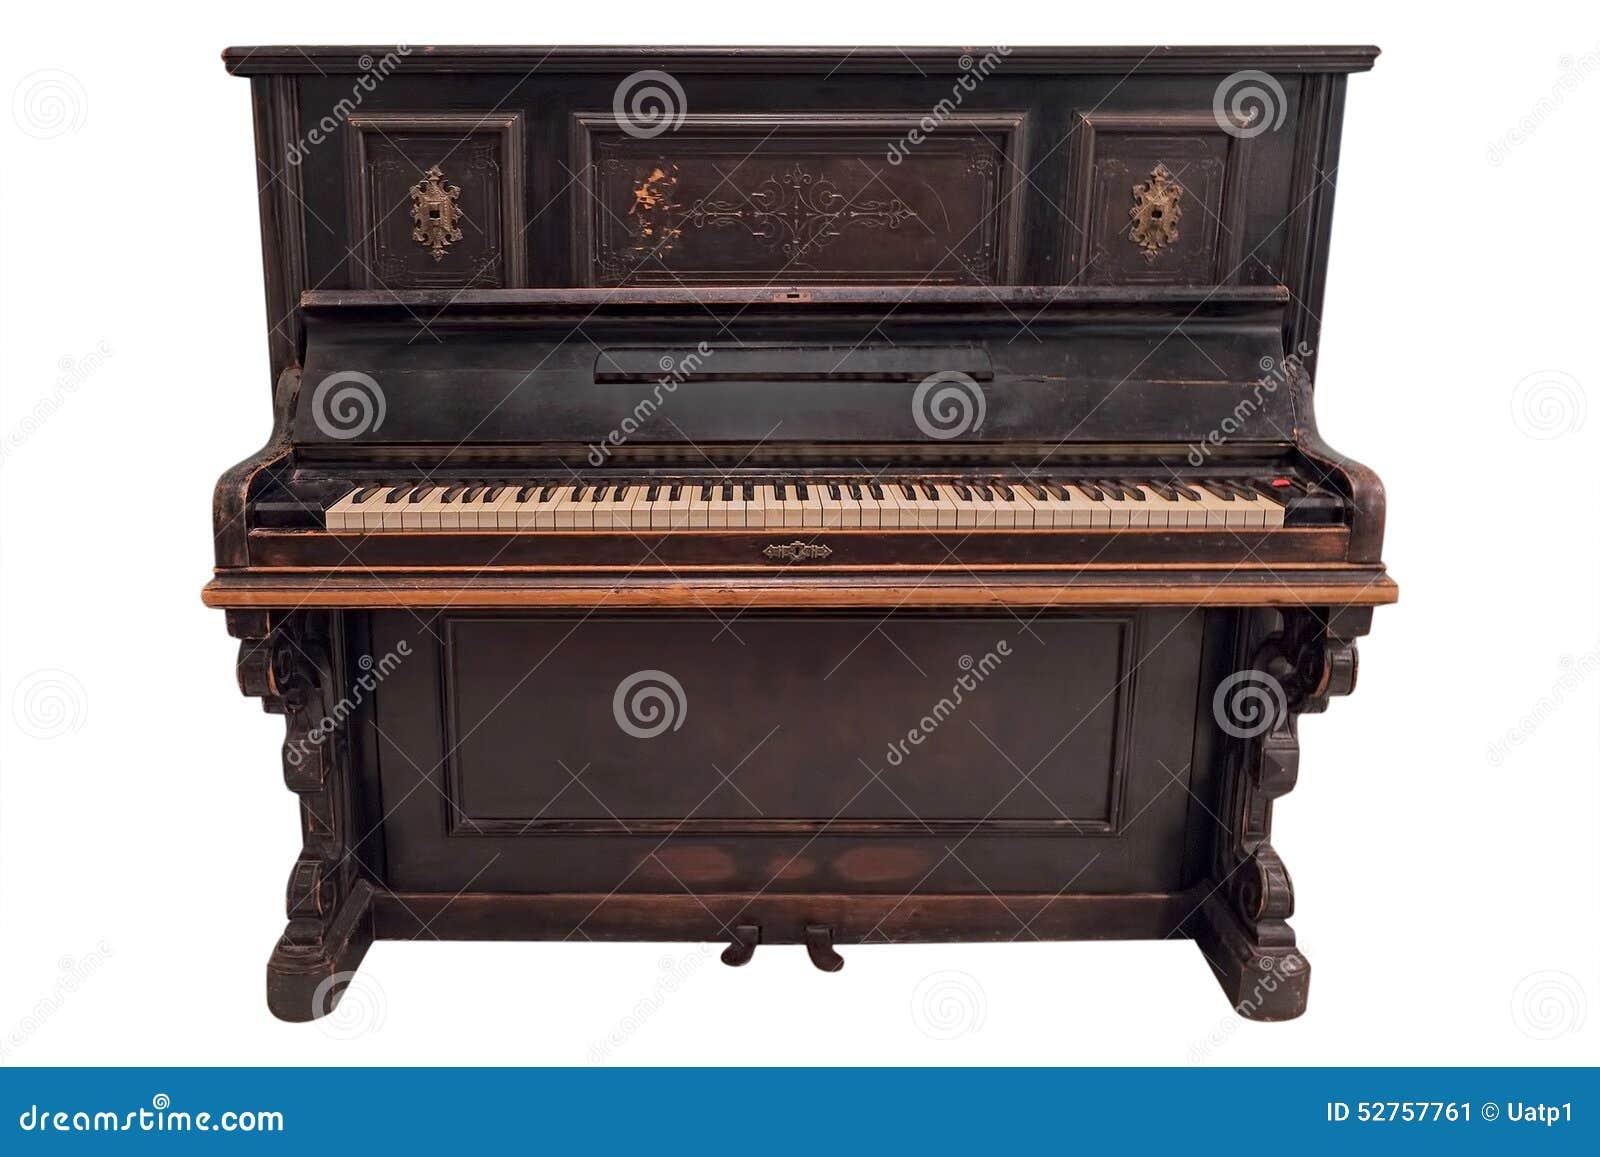 Old fashioned piano